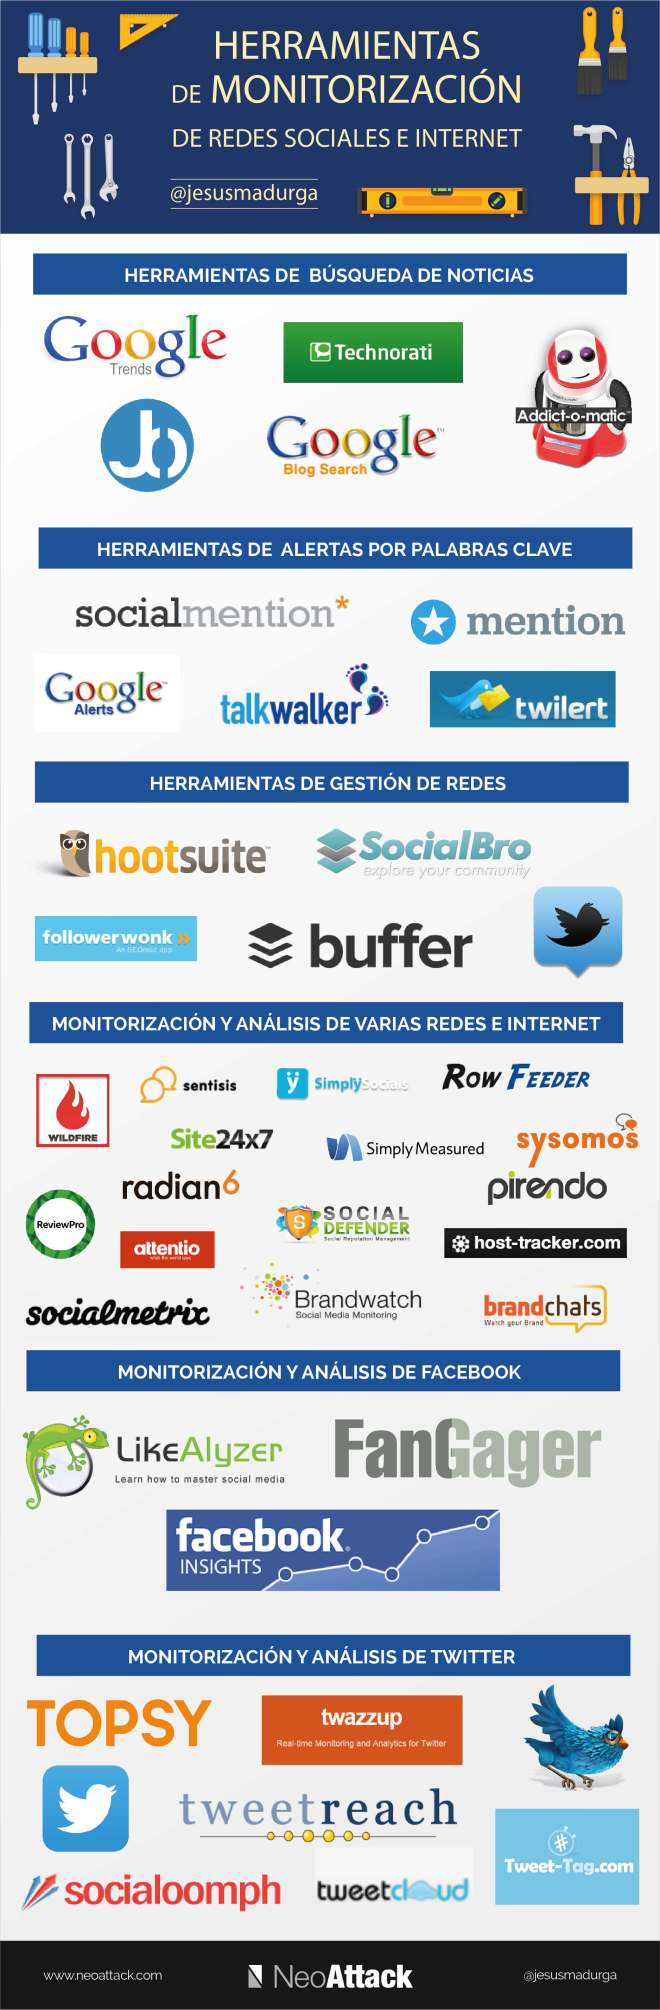 Herramientas de monitorización para Redes Sociales e Internet